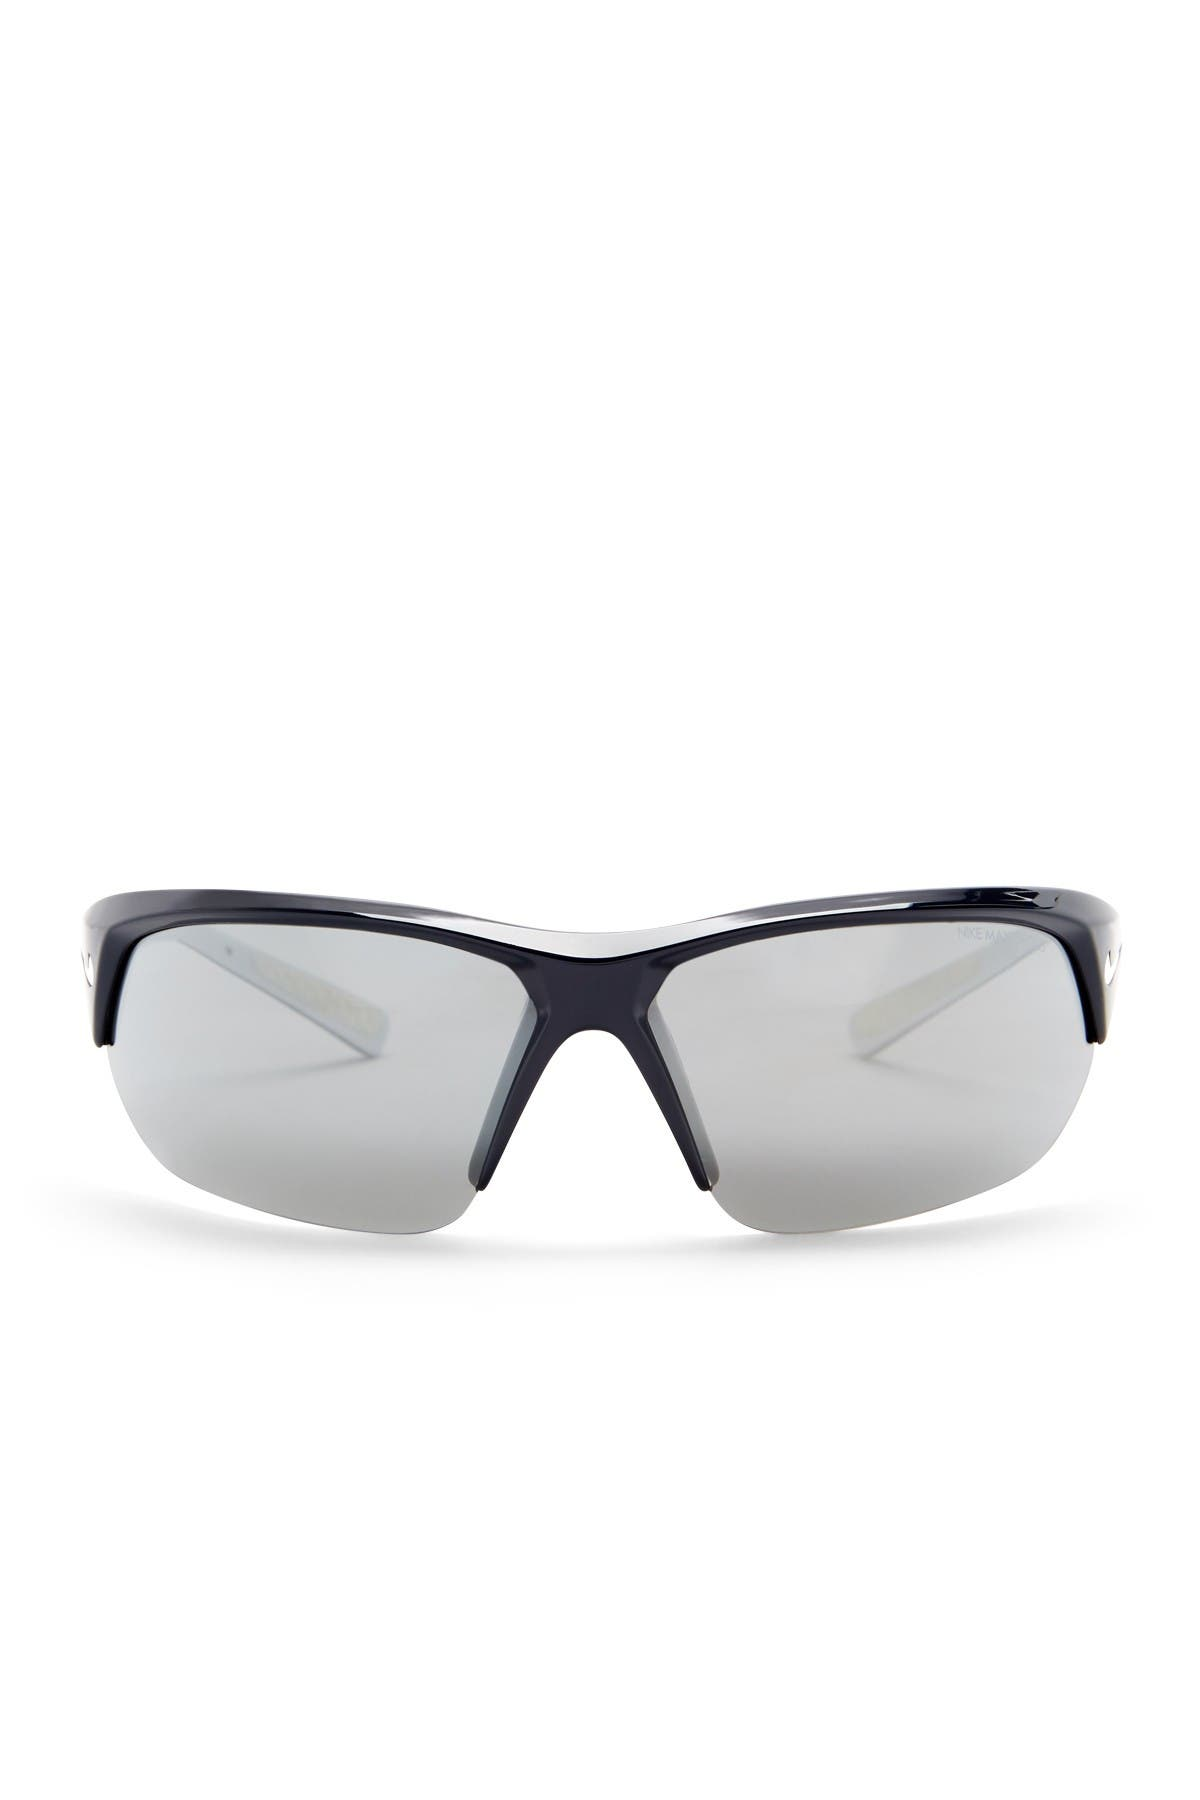 Image of Nike Skylon Ace 69mm Wrap Sunglasses